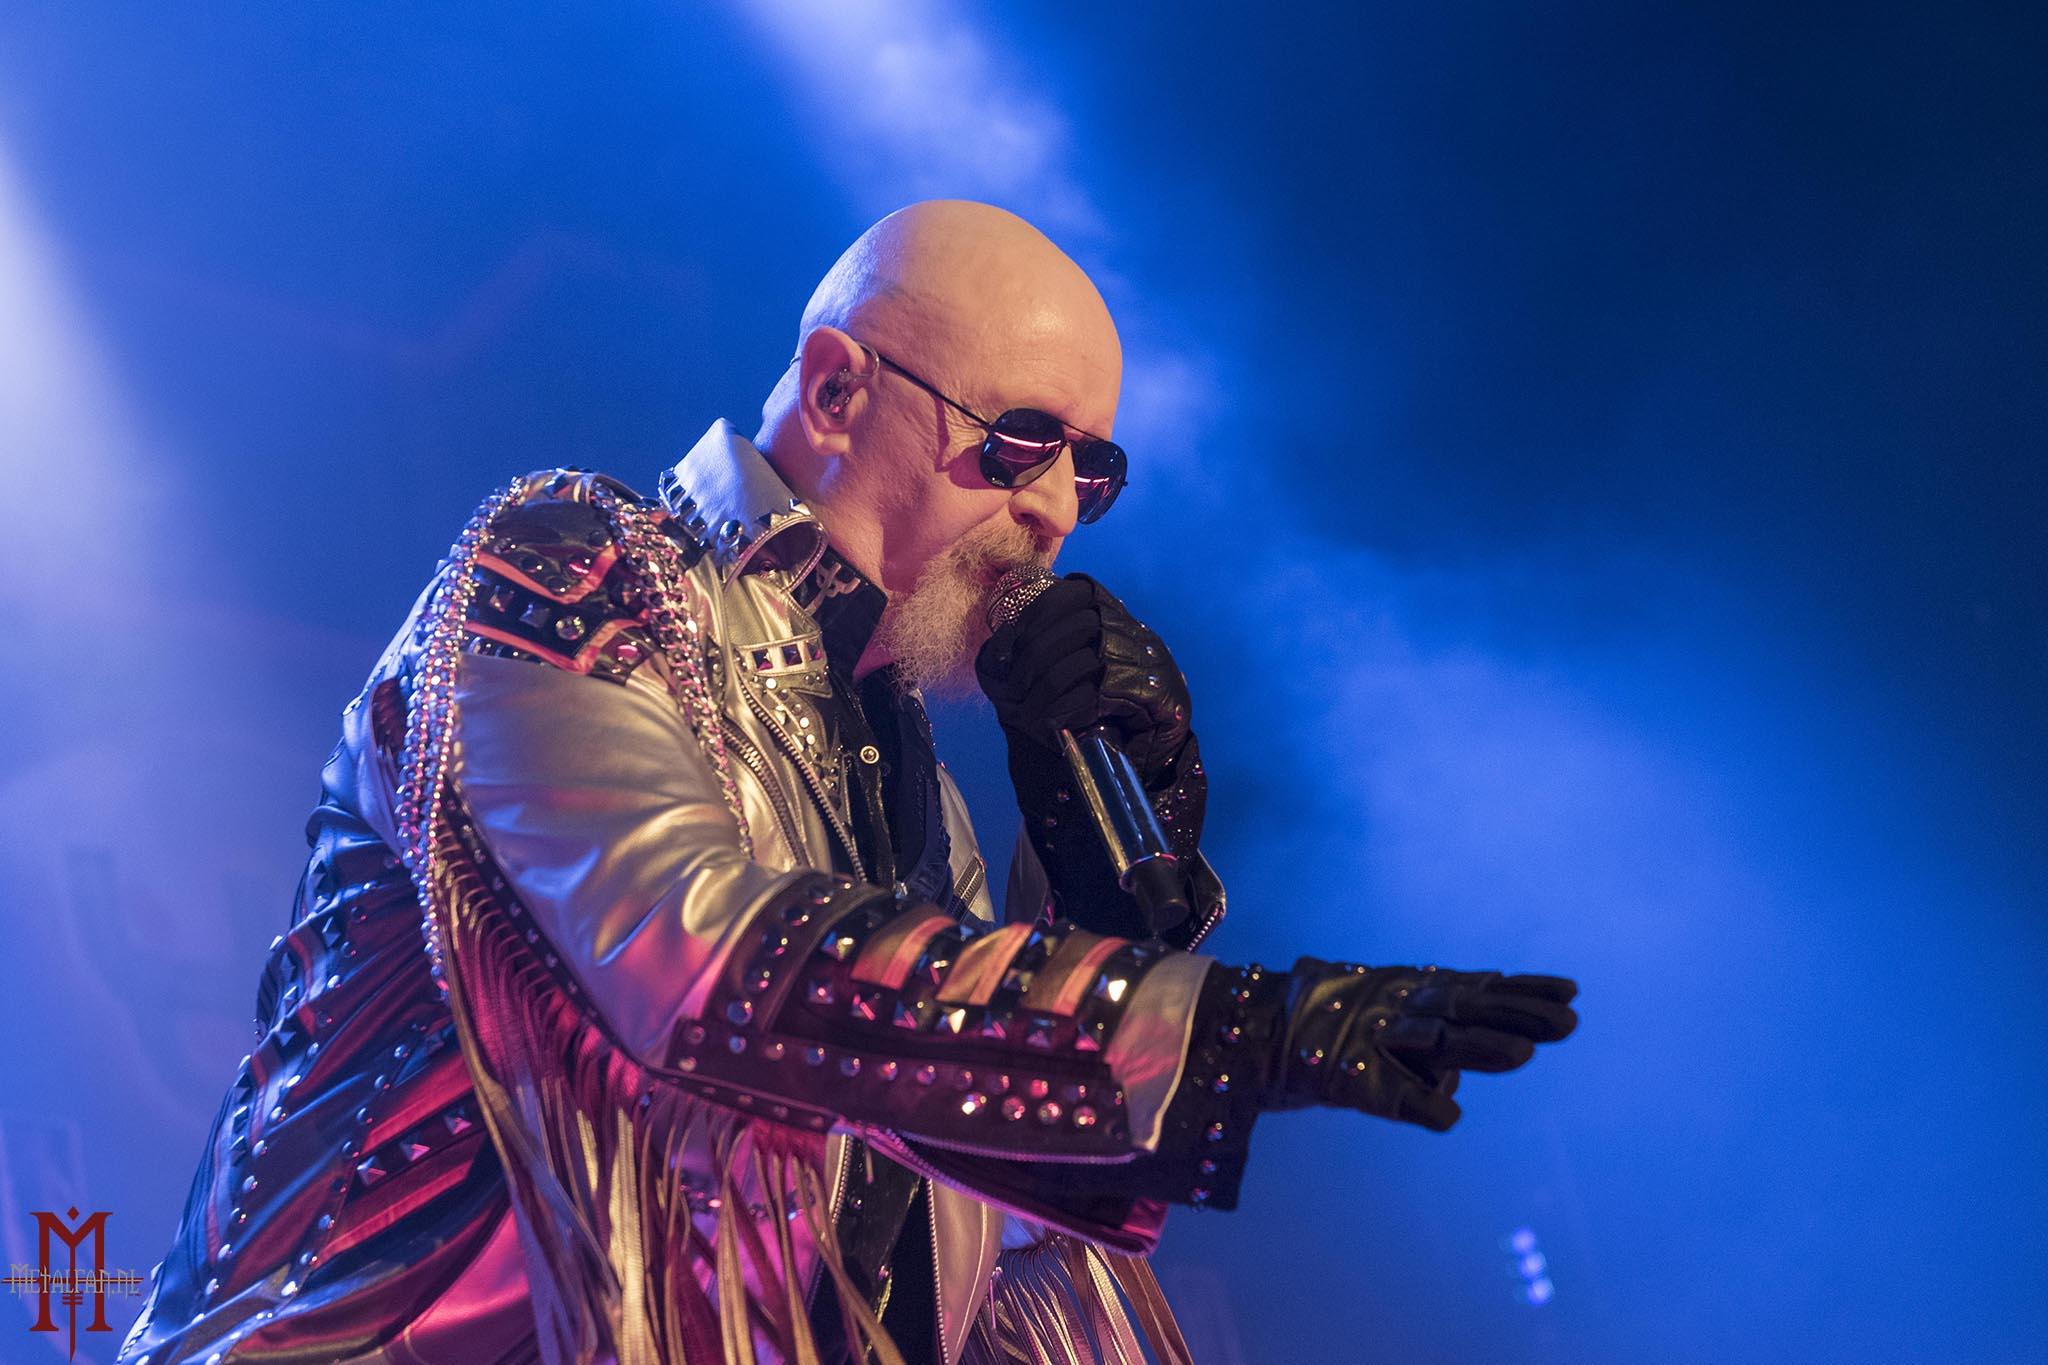 Judas Priest @ 013, Tilburg, 6-8-2018